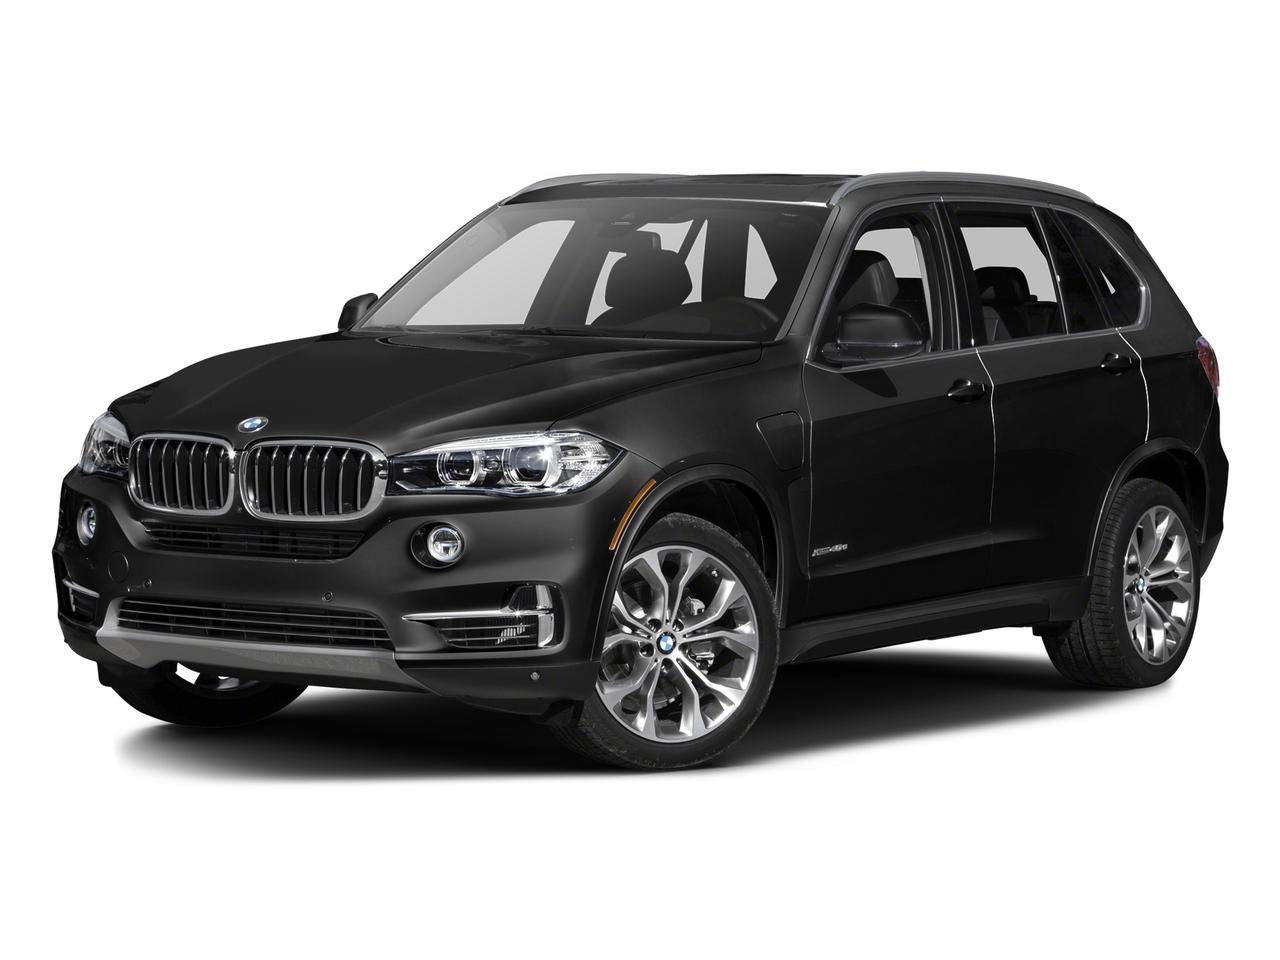 2016 BMW X5 xDrive40e Vehicle Photo in Pleasanton, CA 94588